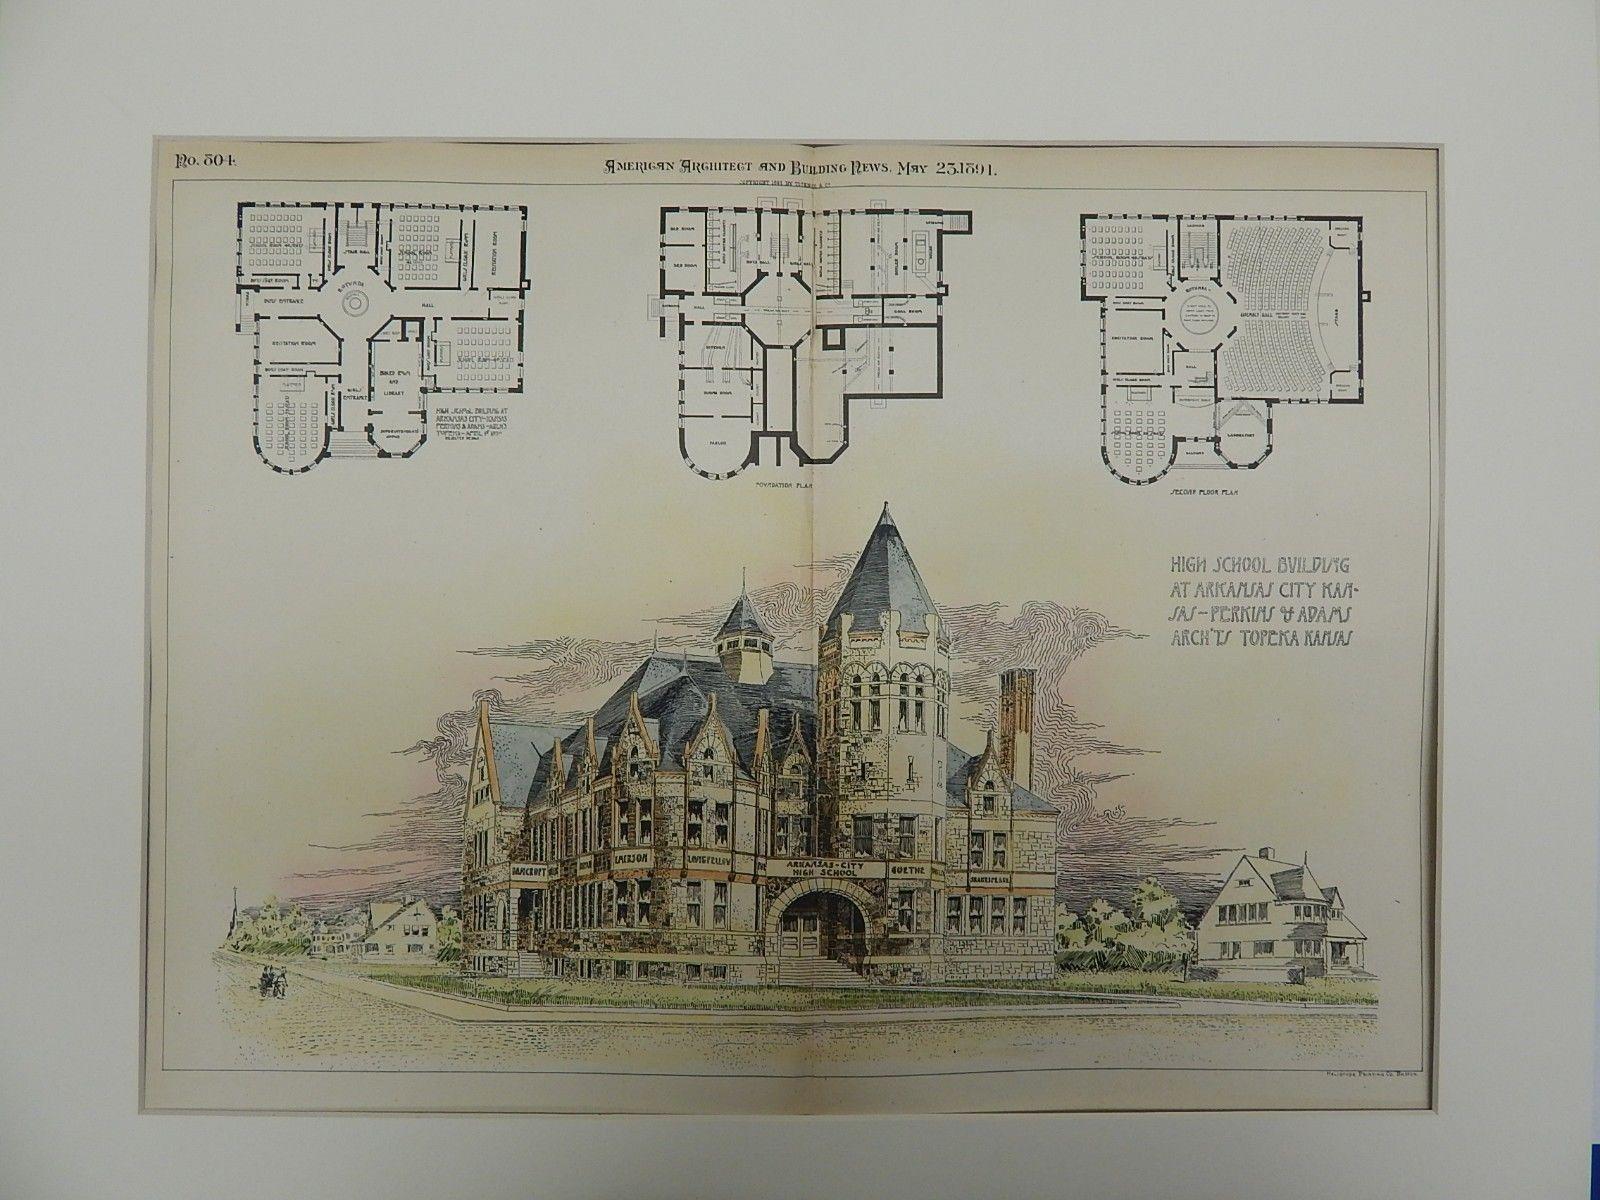 High school building arkansas city kansas 1891 original plan perkins adams